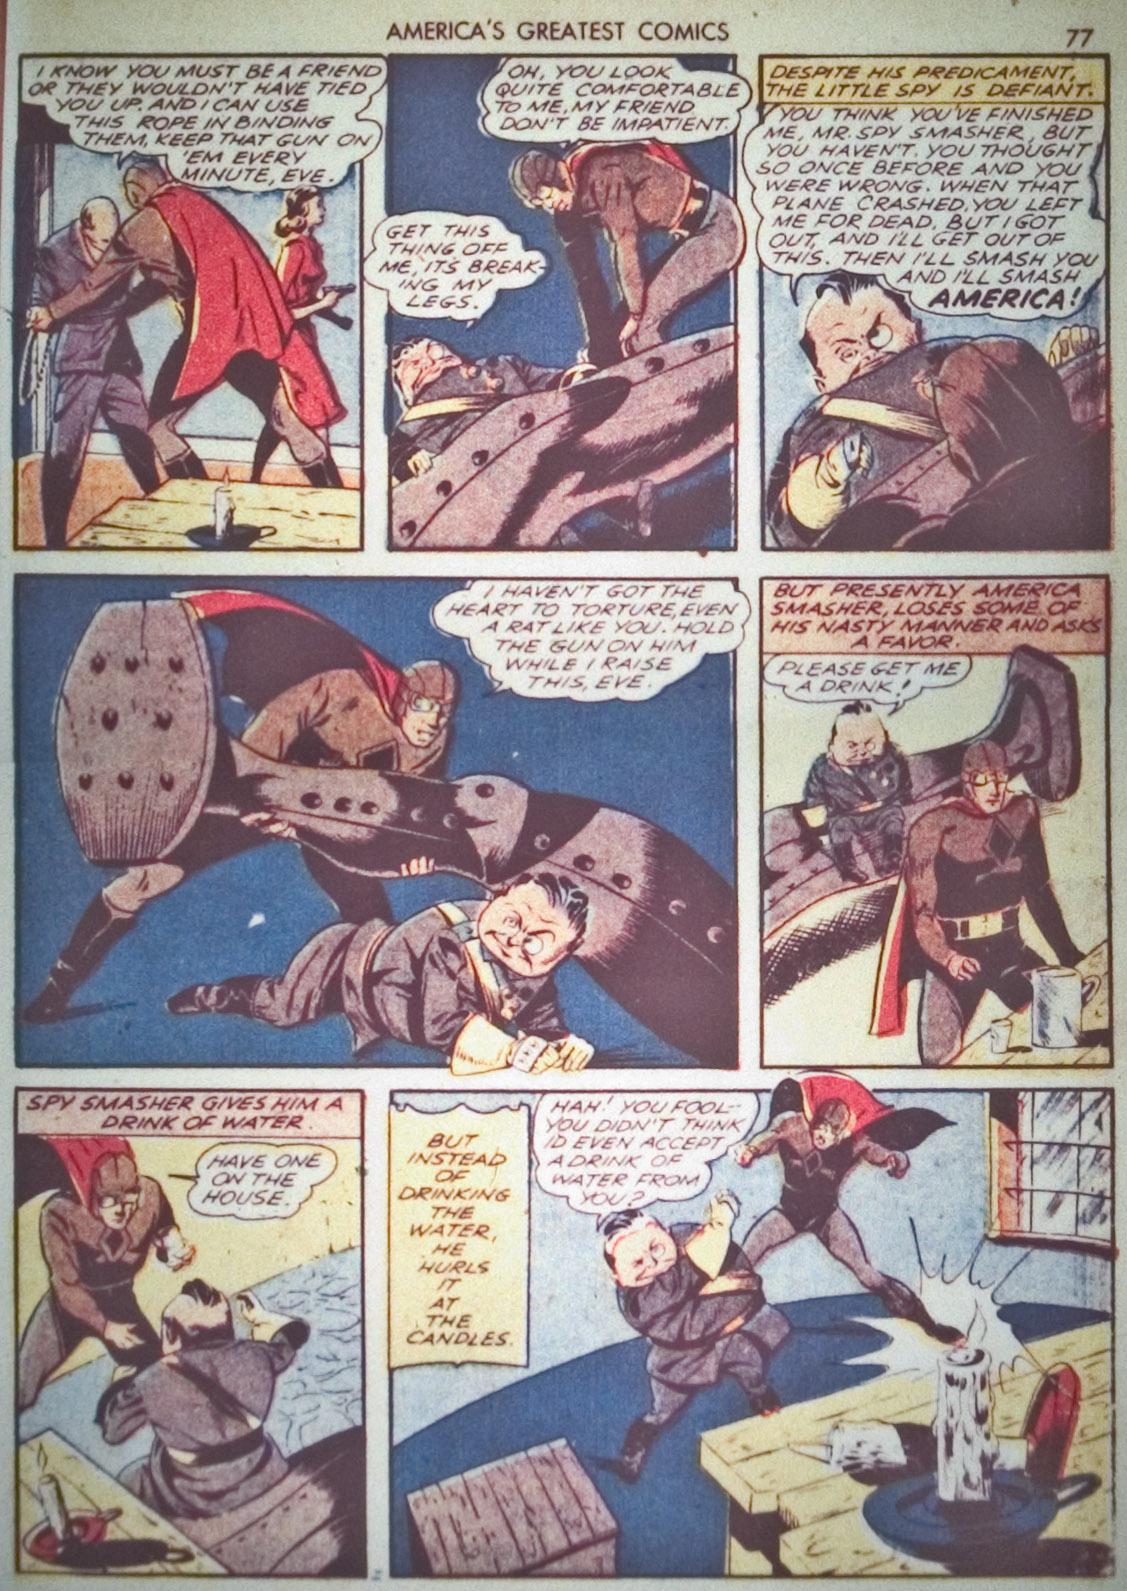 Read online America's Greatest Comics comic -  Issue #1 - 80